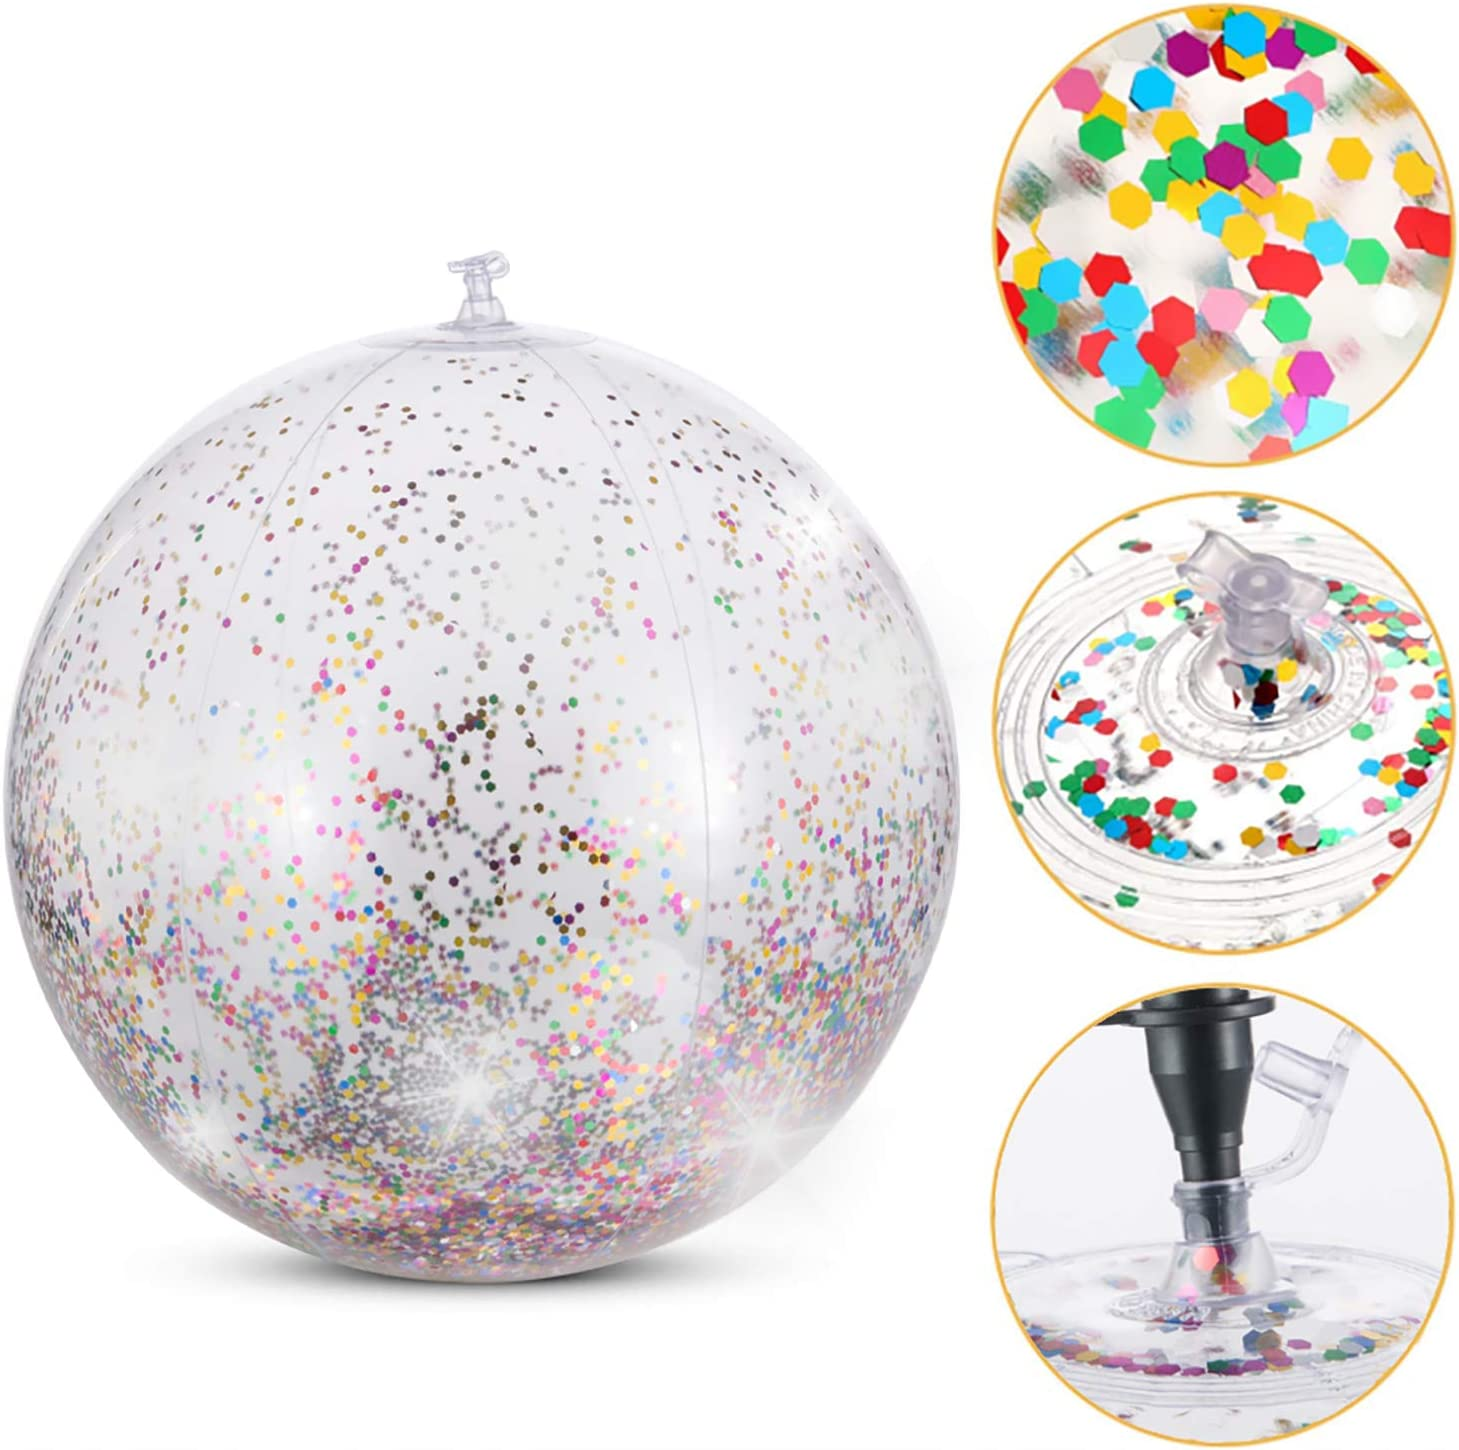 24 Inch 16 Inch 2 Pieces Sequin Beach Ball Inflatable Glitter Beach Ball for Summer Beach Favor